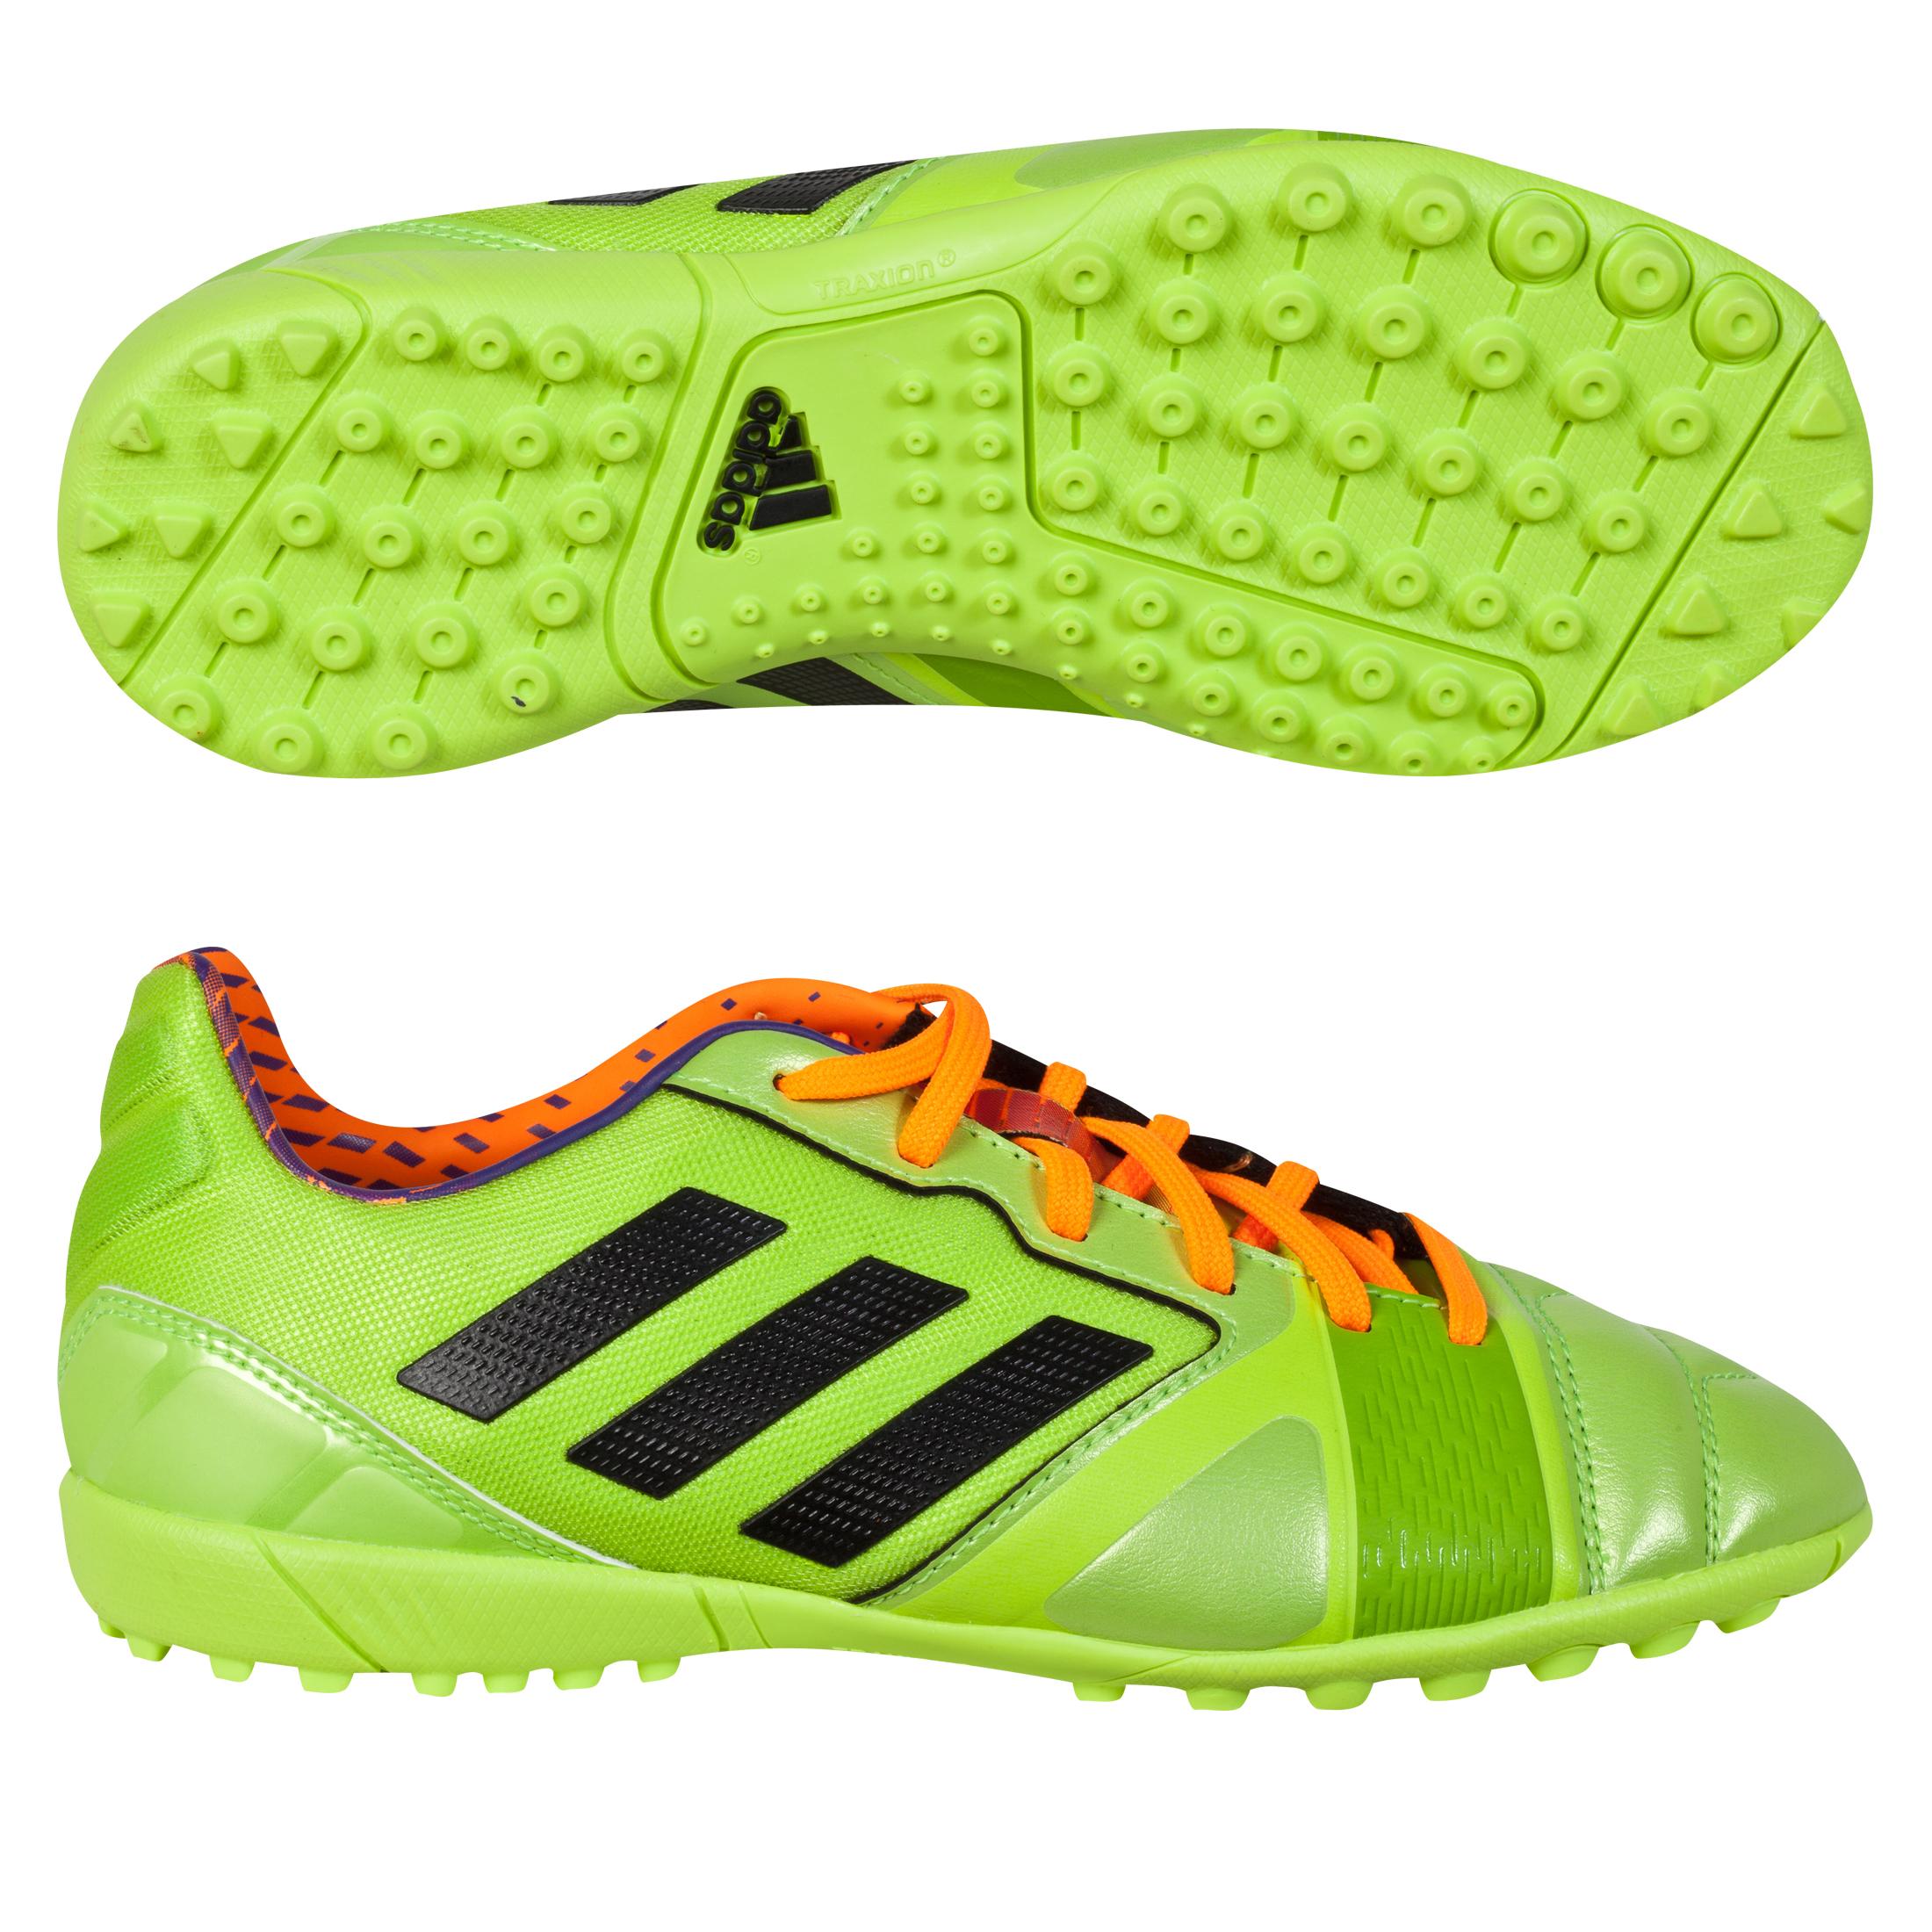 Adidas Nitrocharge 2.0 TRX Astroturf Kids Green